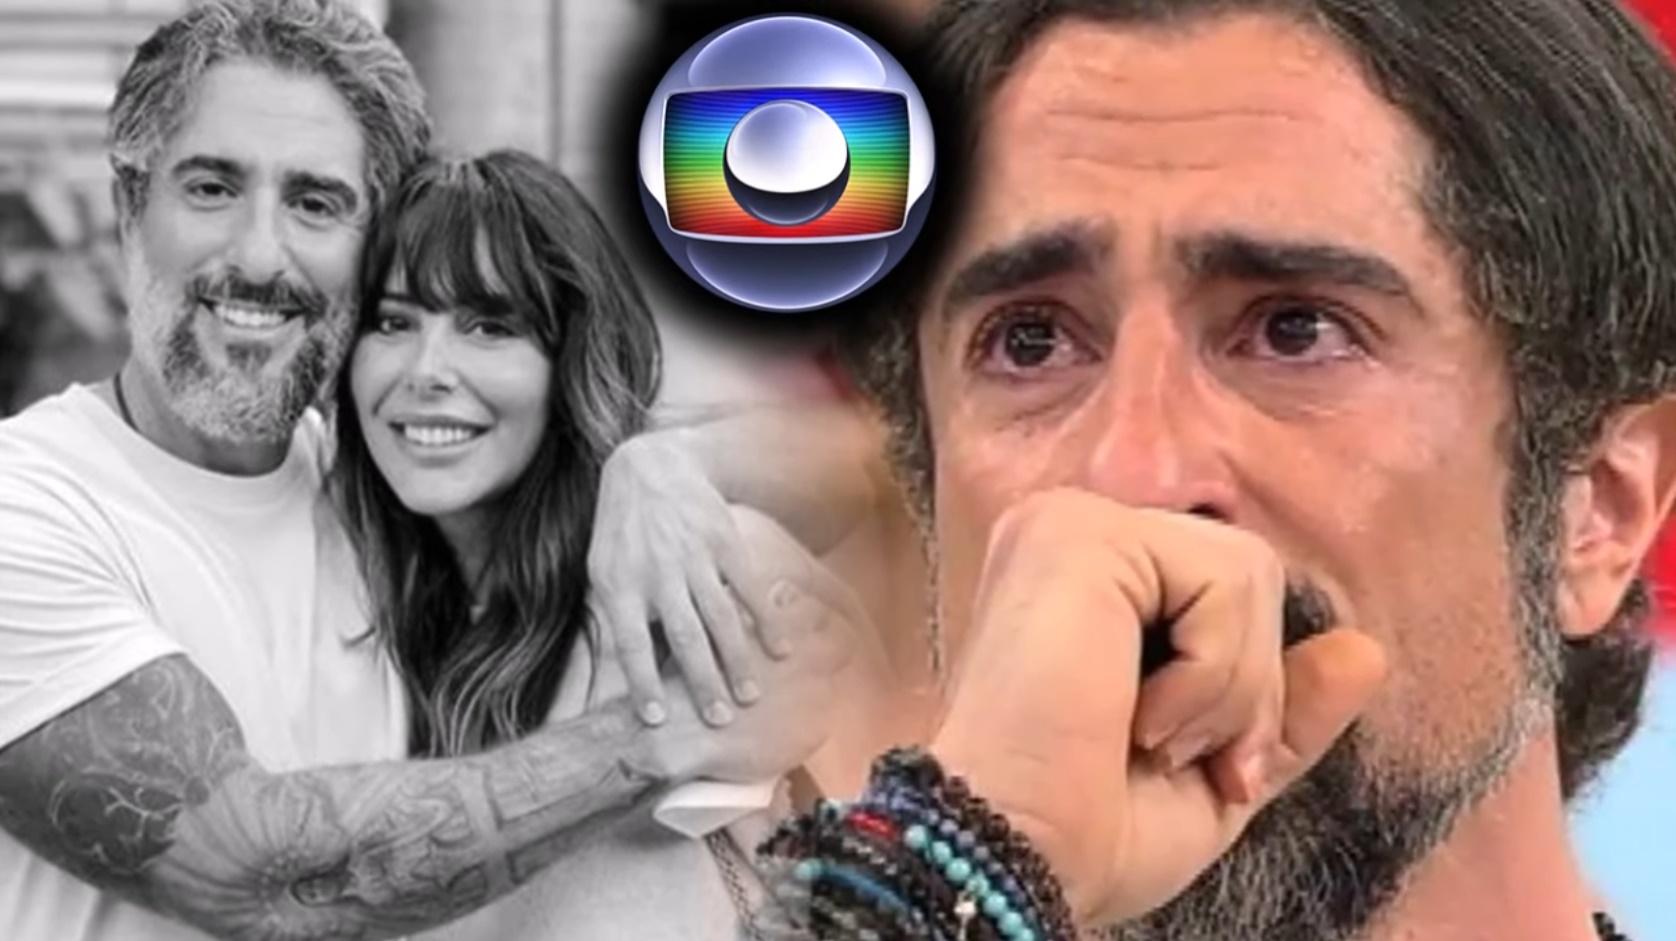 "URGENTE: Esposa de Marcos Mion acaba de confirmar as pressas triste notícia sobre o Apresentador aos 42 anos ""Descanse"""